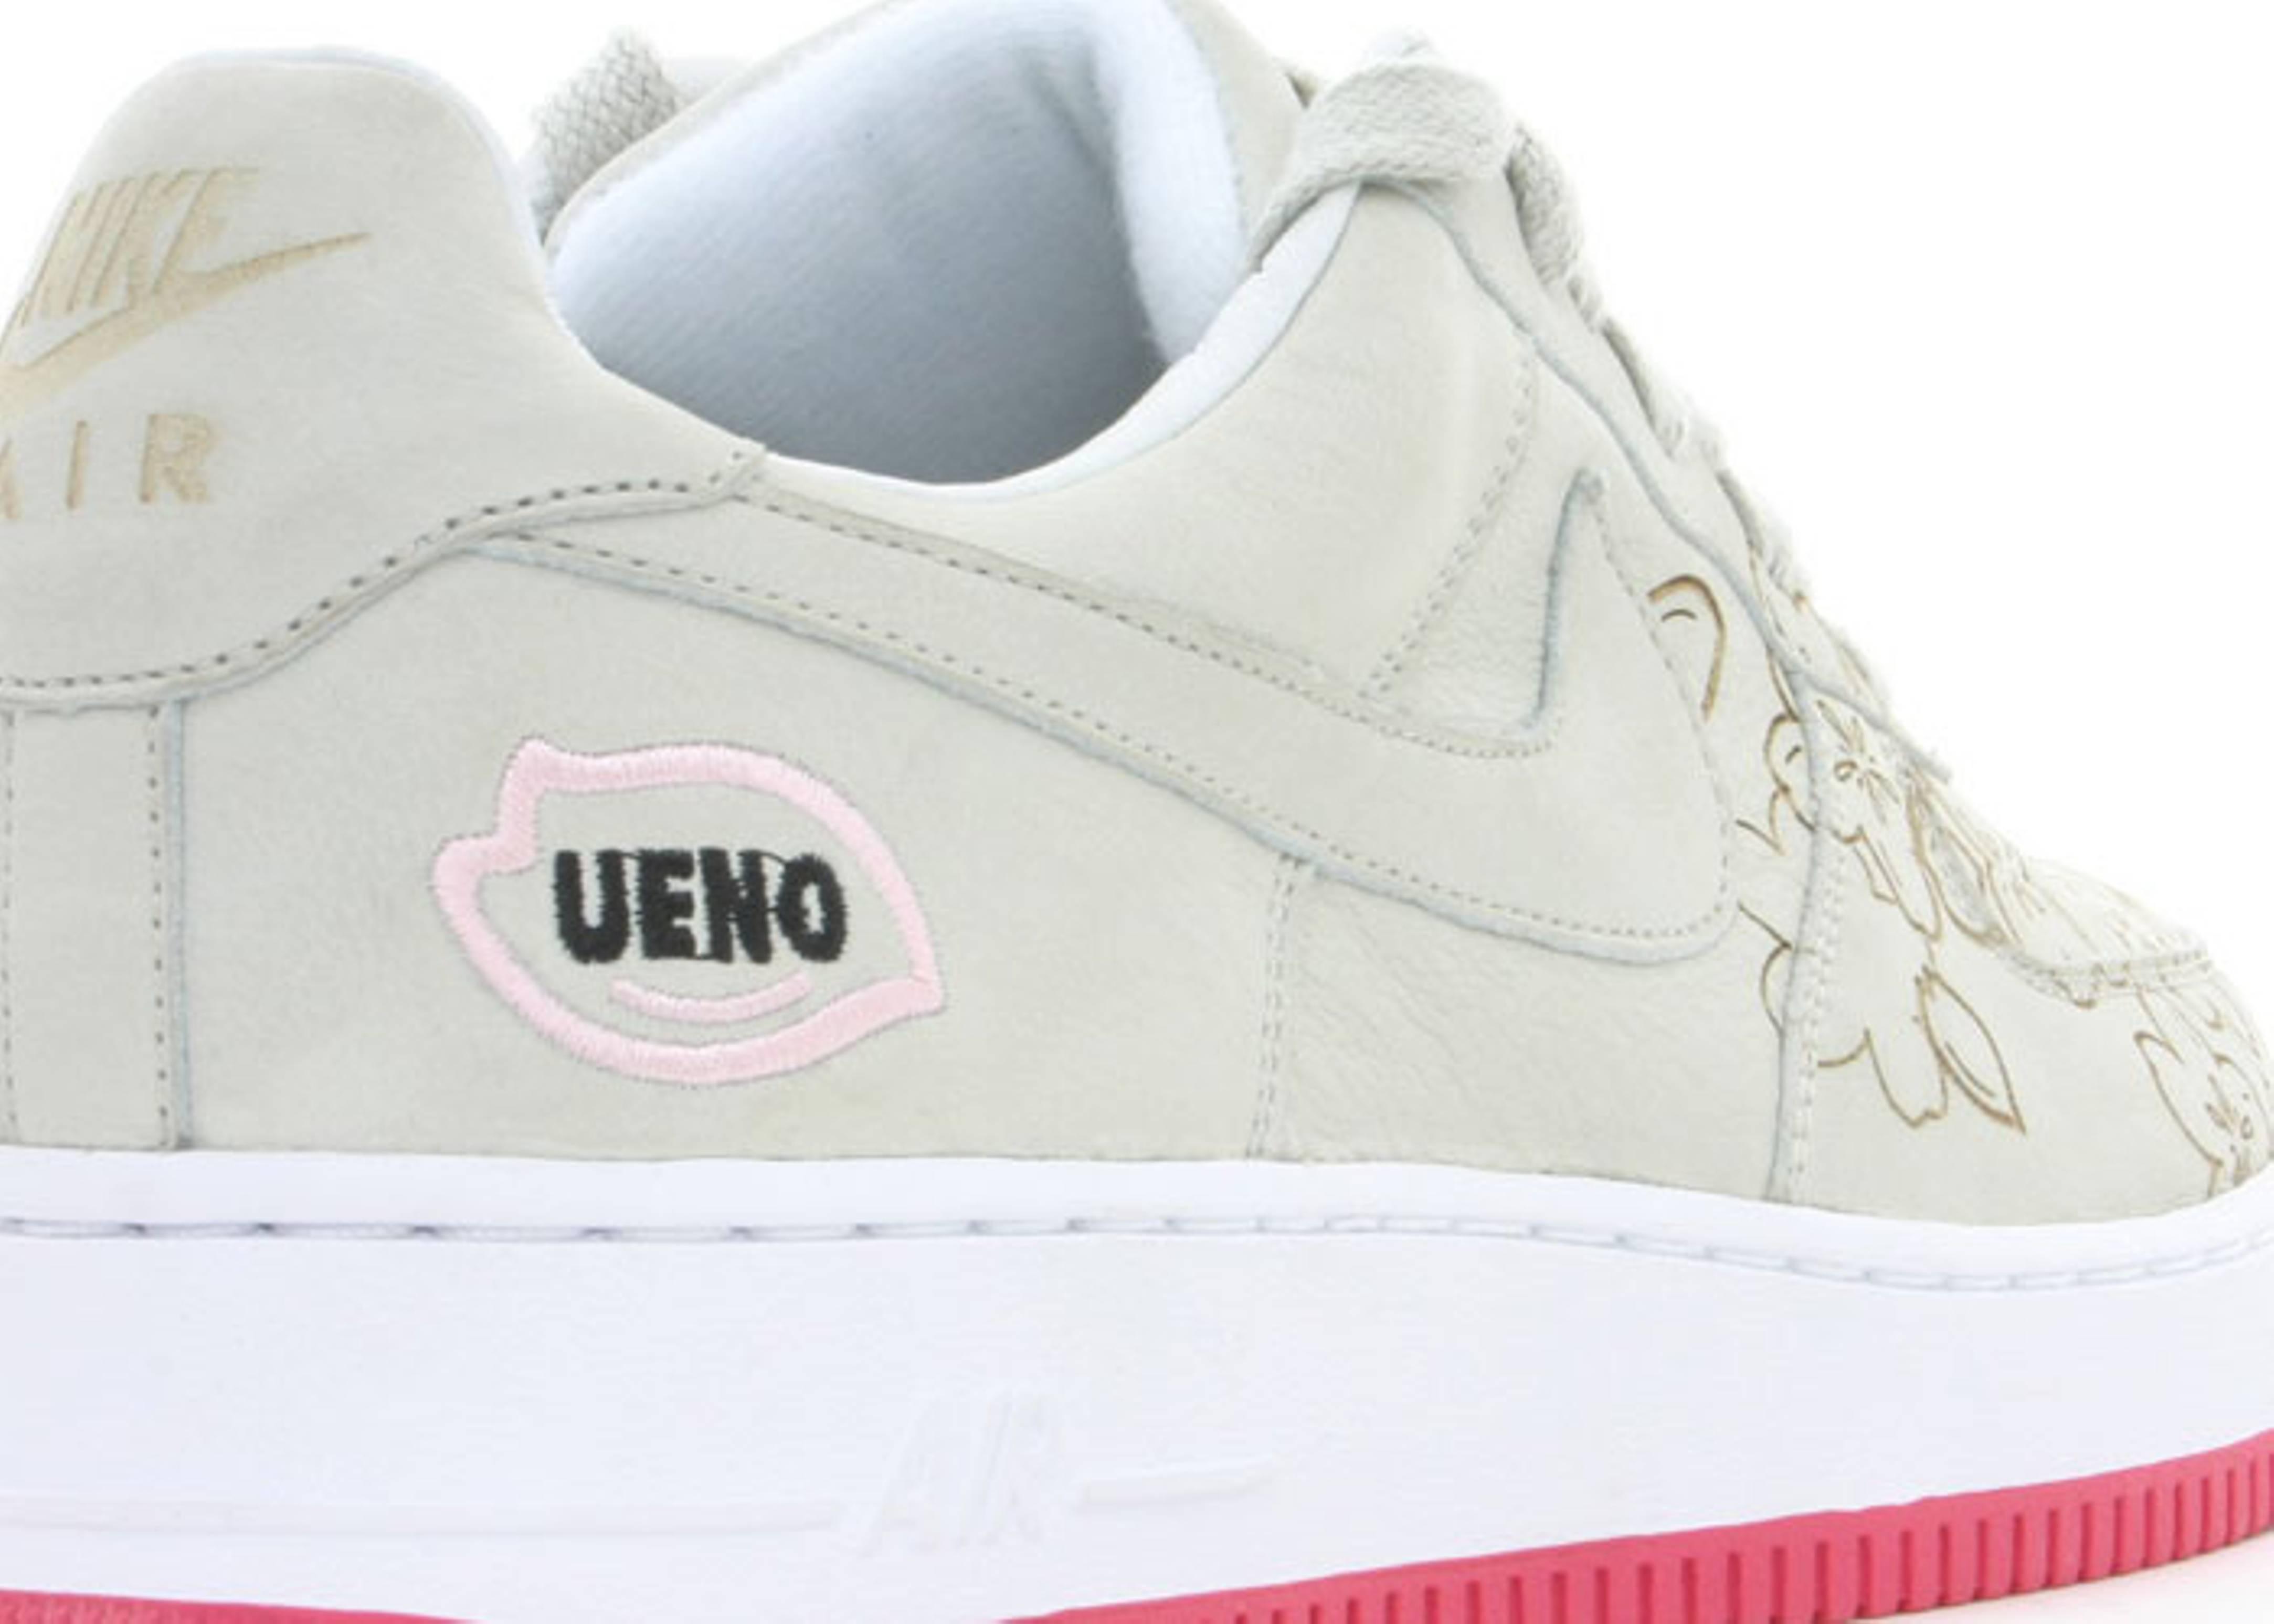 Nike Air Force 1 (Ones) Low Ueno Bone Watermelon White